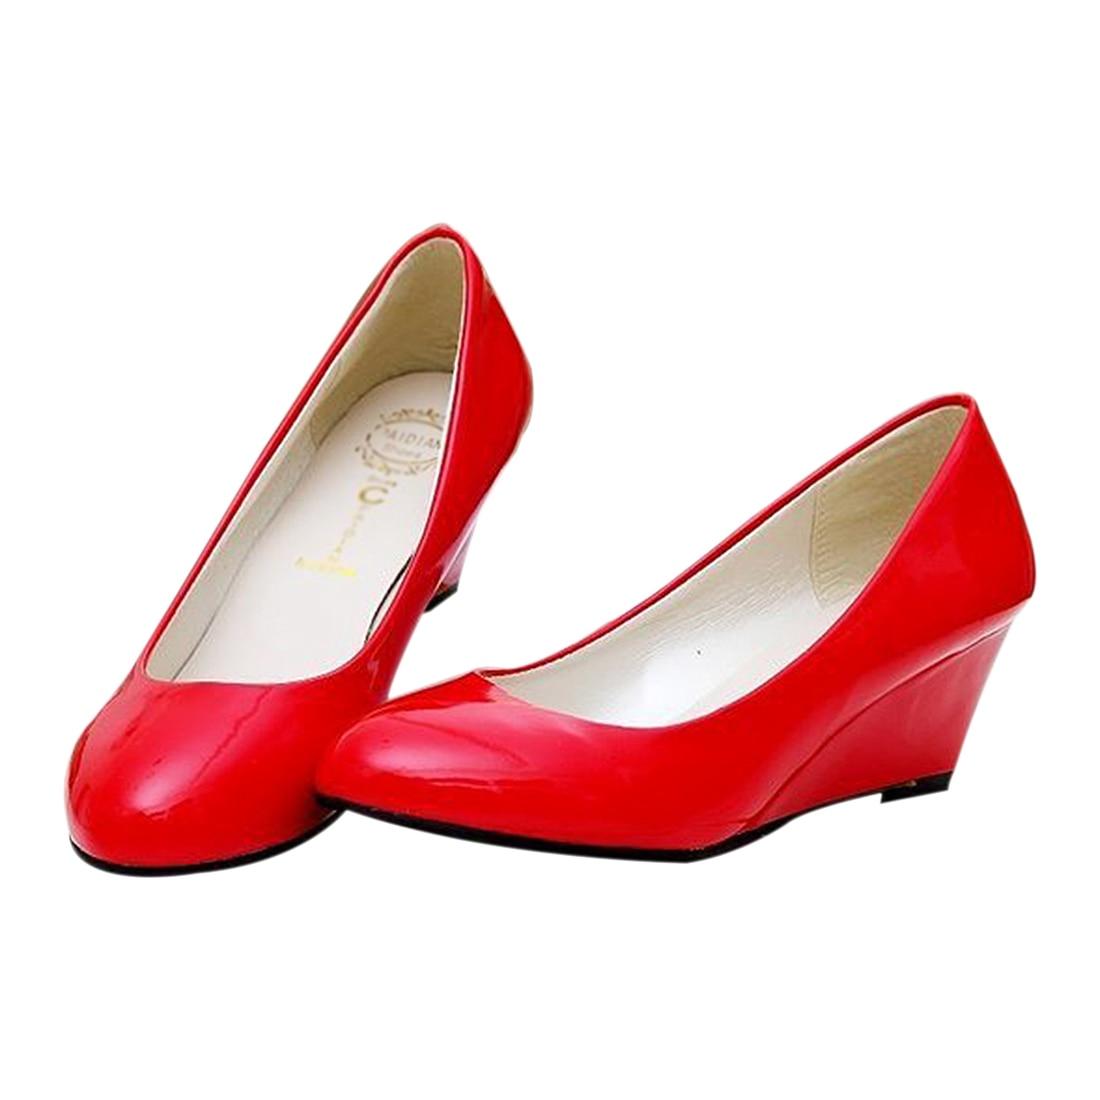 ABDB Classic Sexy Office Lady Round Toe Platform Low Heels Women Wedding Pumps Shoes Suede Plus Size недорго, оригинальная цена